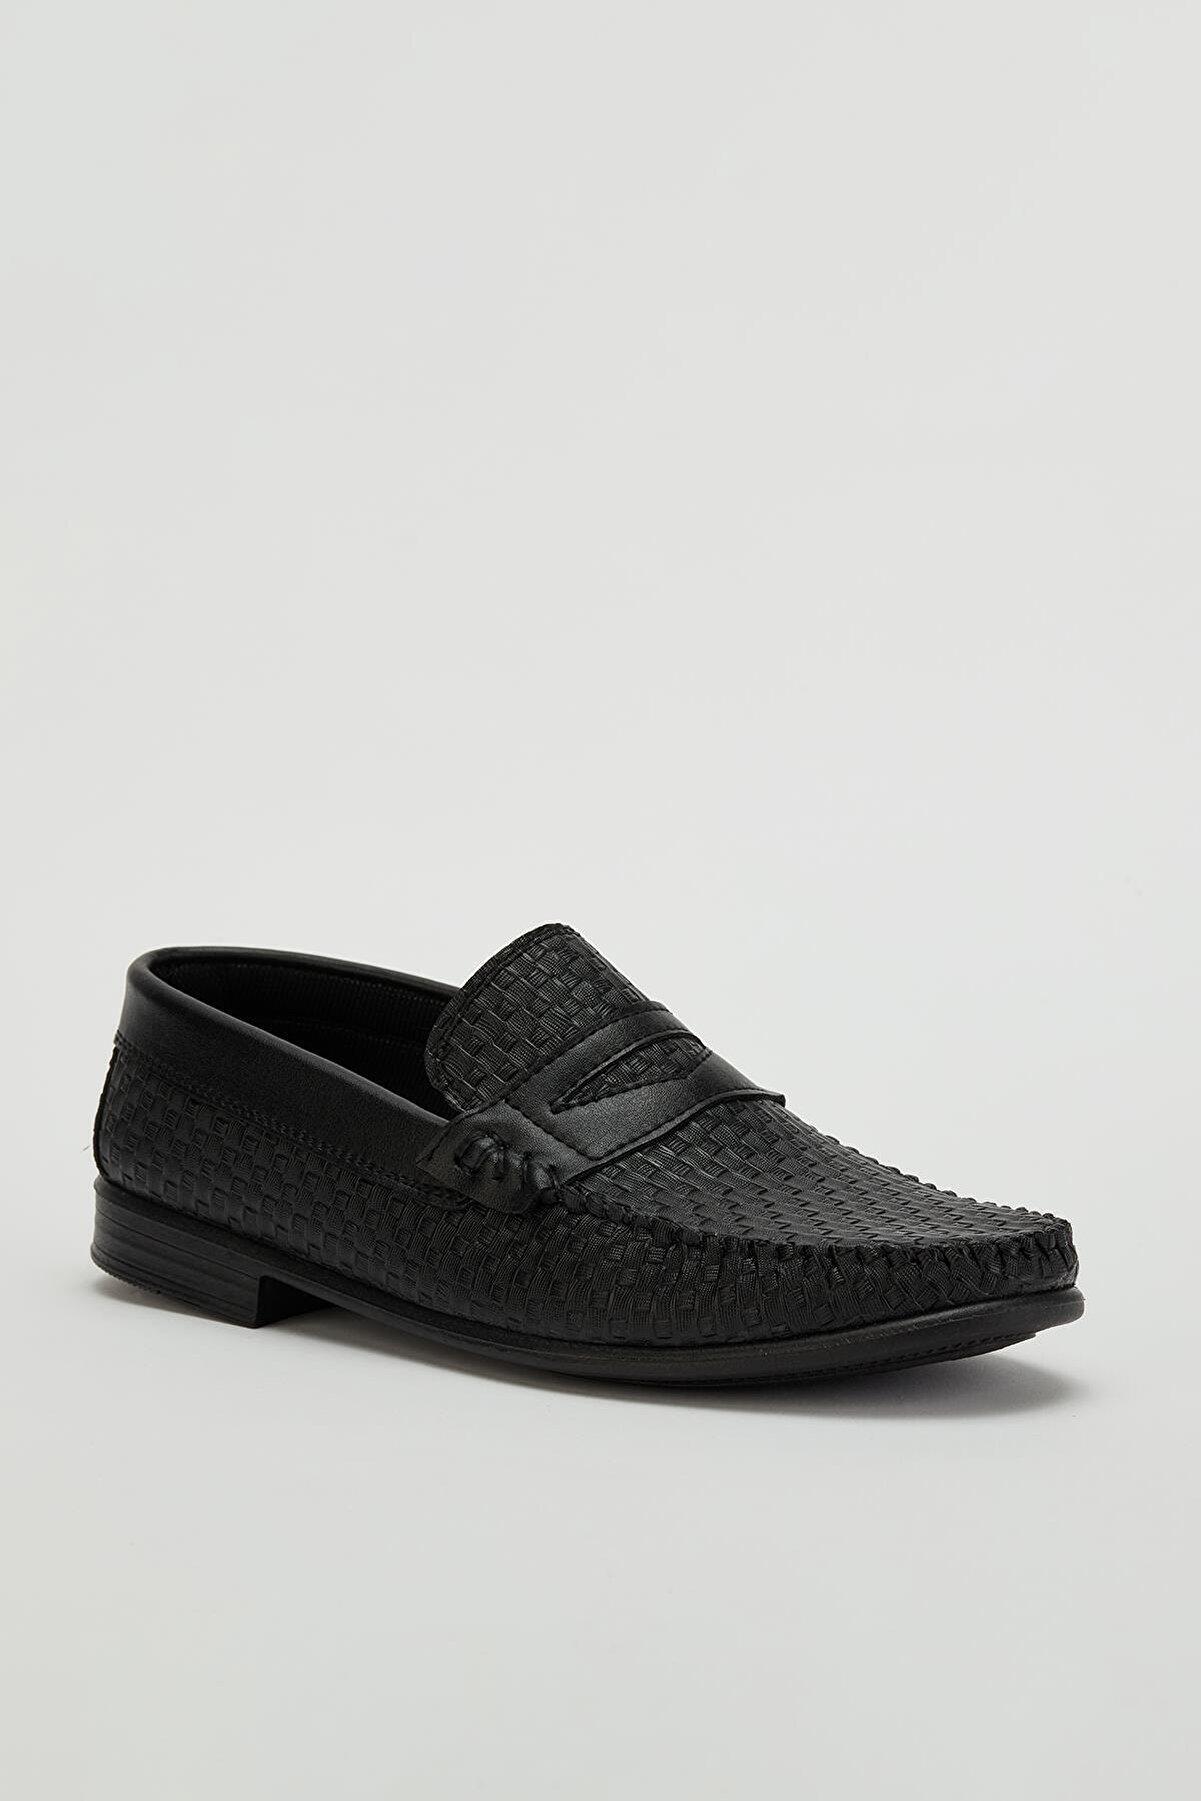 Muggo MGLİON03 Erkek Loafer Ayakkabı